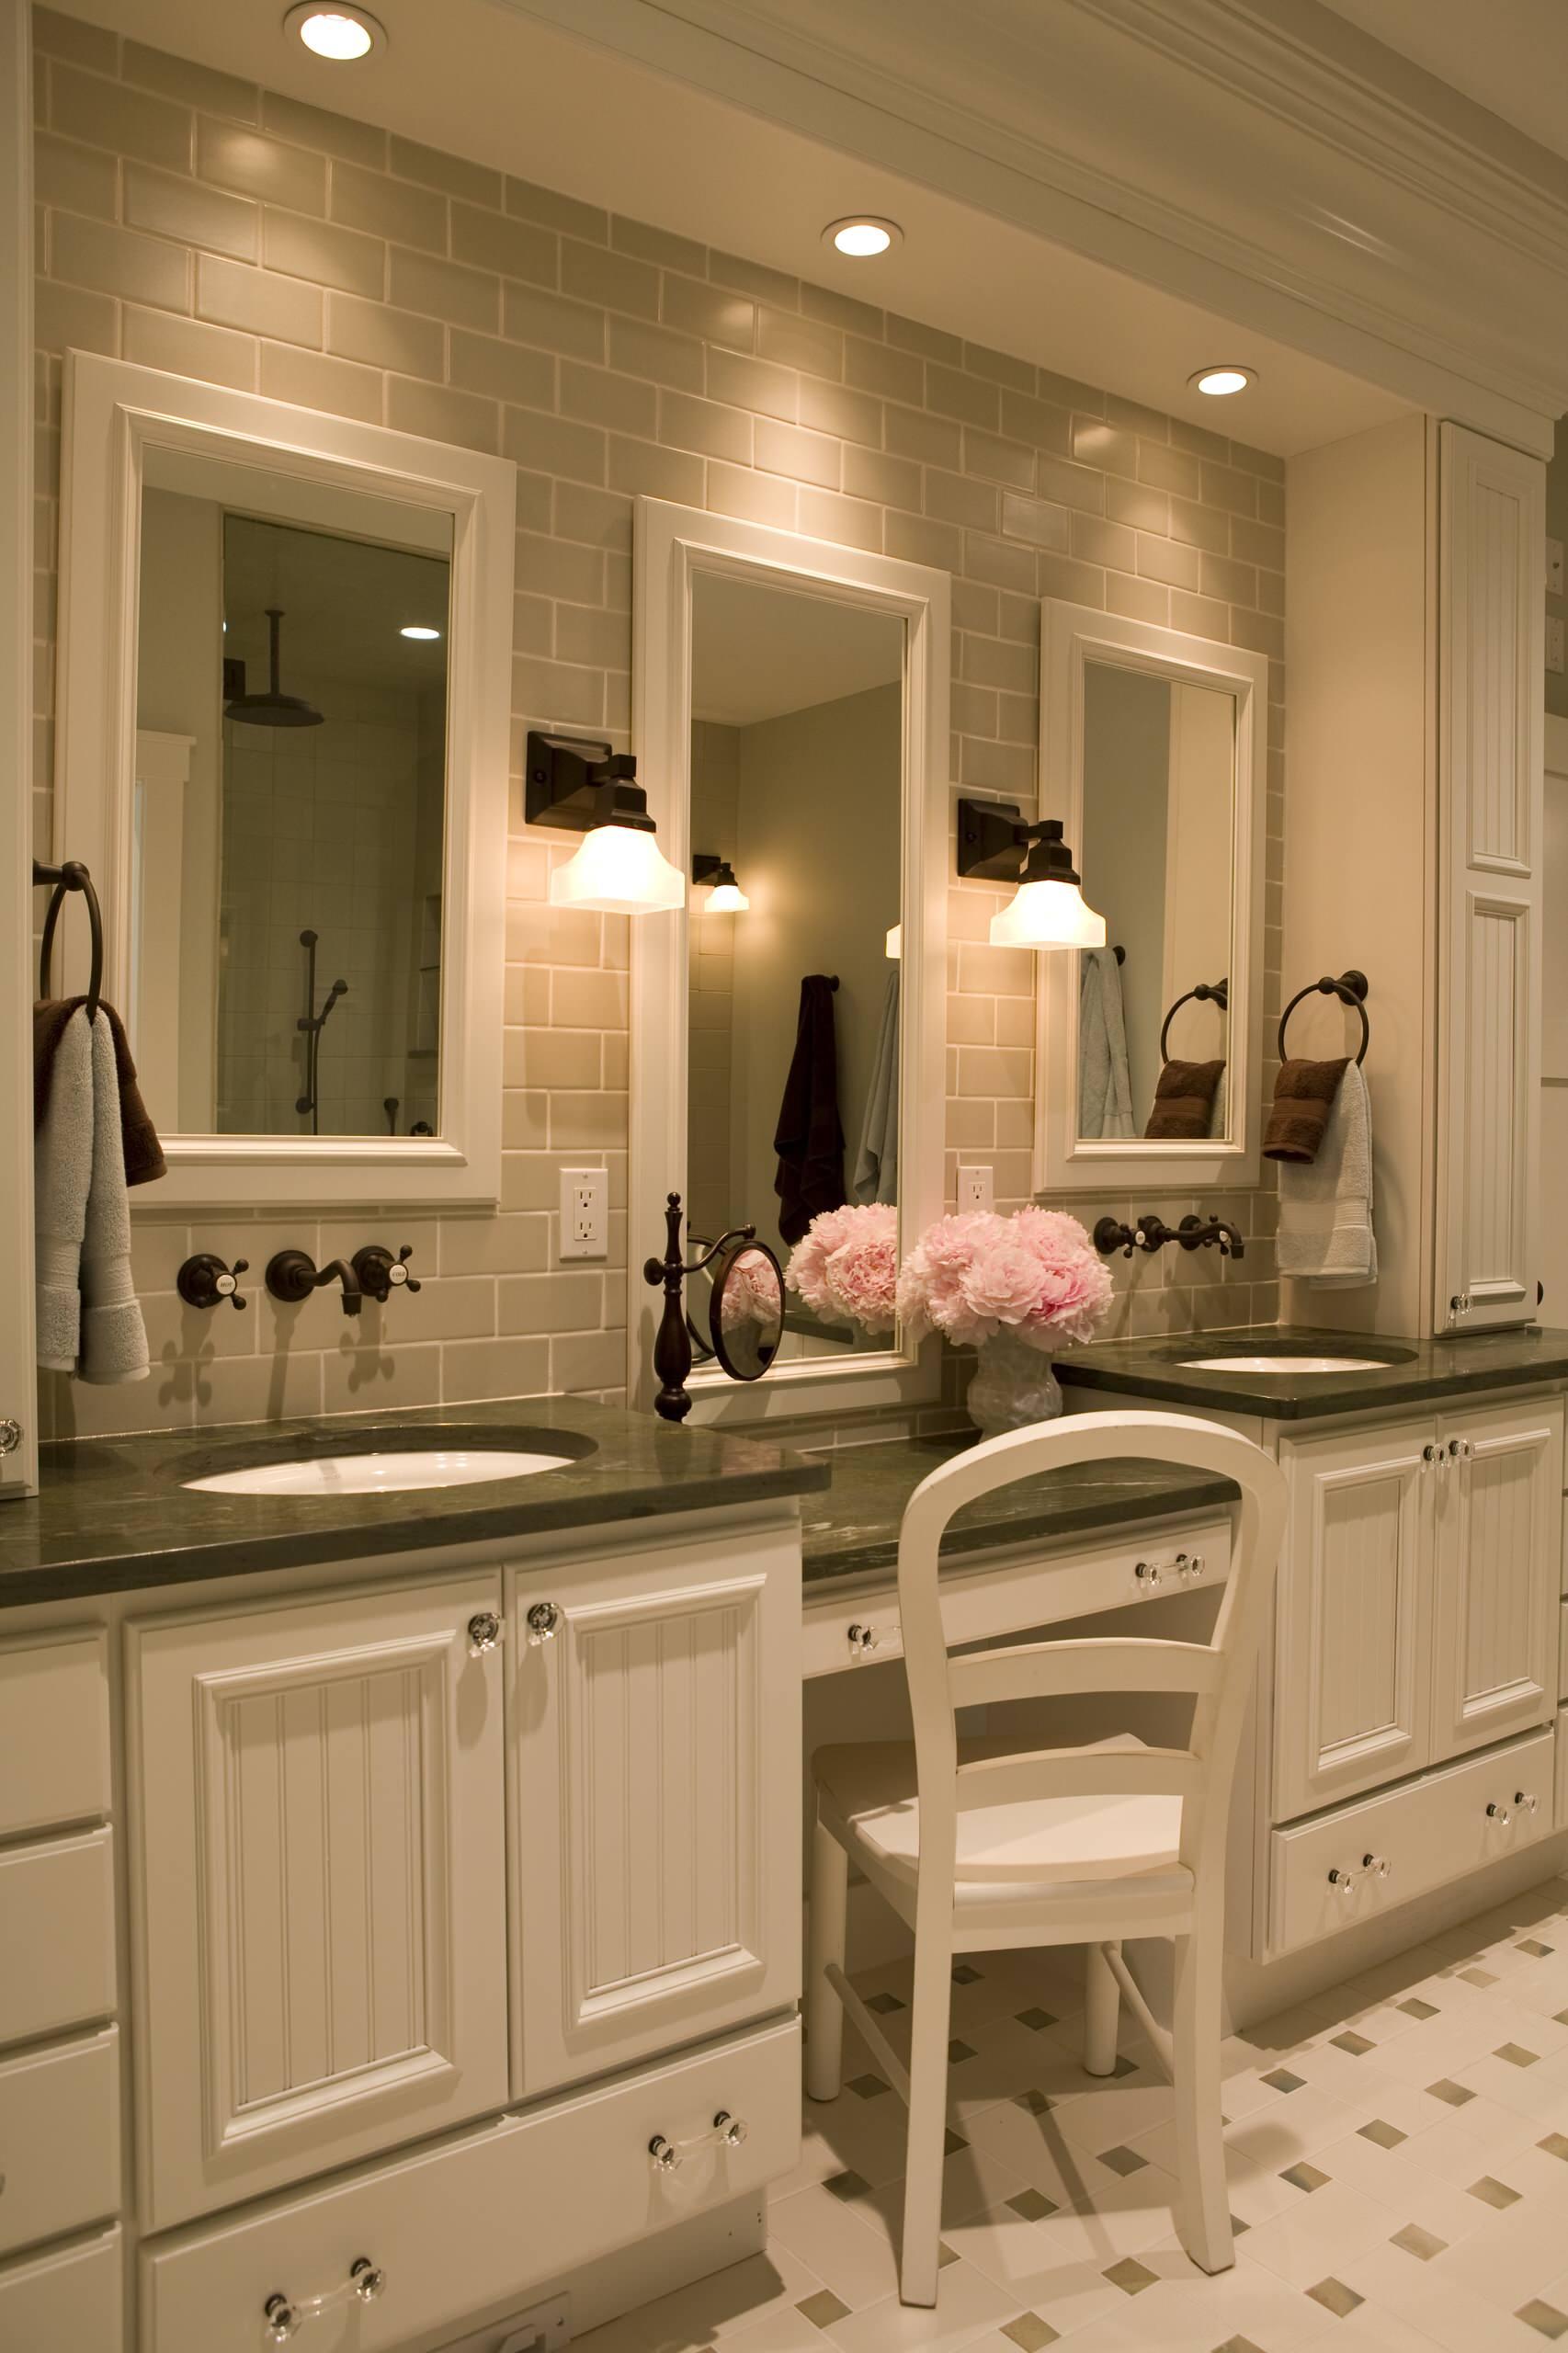 3 Mirror Bathroom Ideas Houzz